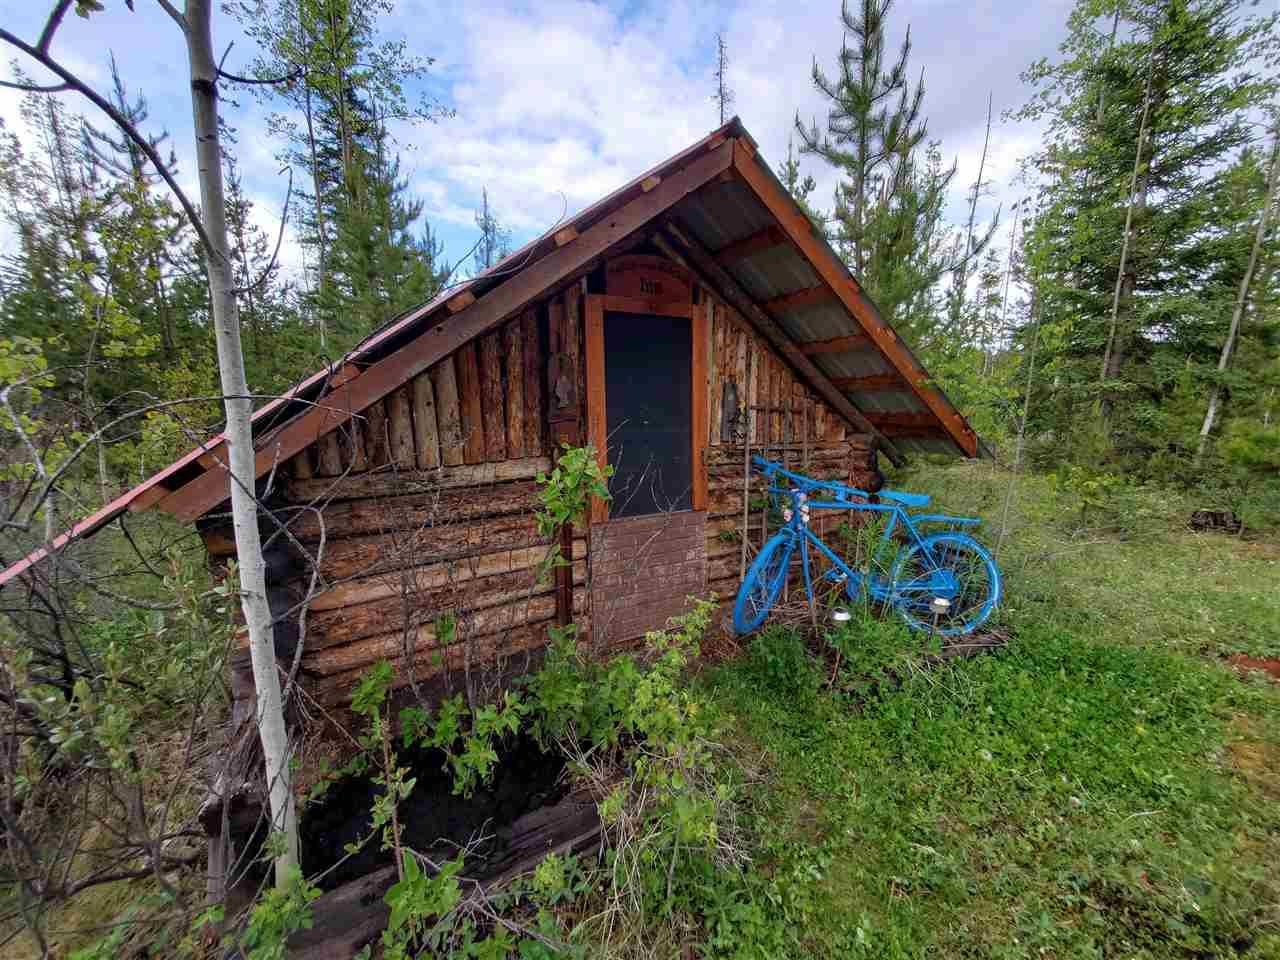 Photo 7: Photos: 9712 NAZKO Road: Bouchie Lake House for sale (Quesnel (Zone 28))  : MLS®# R2592064